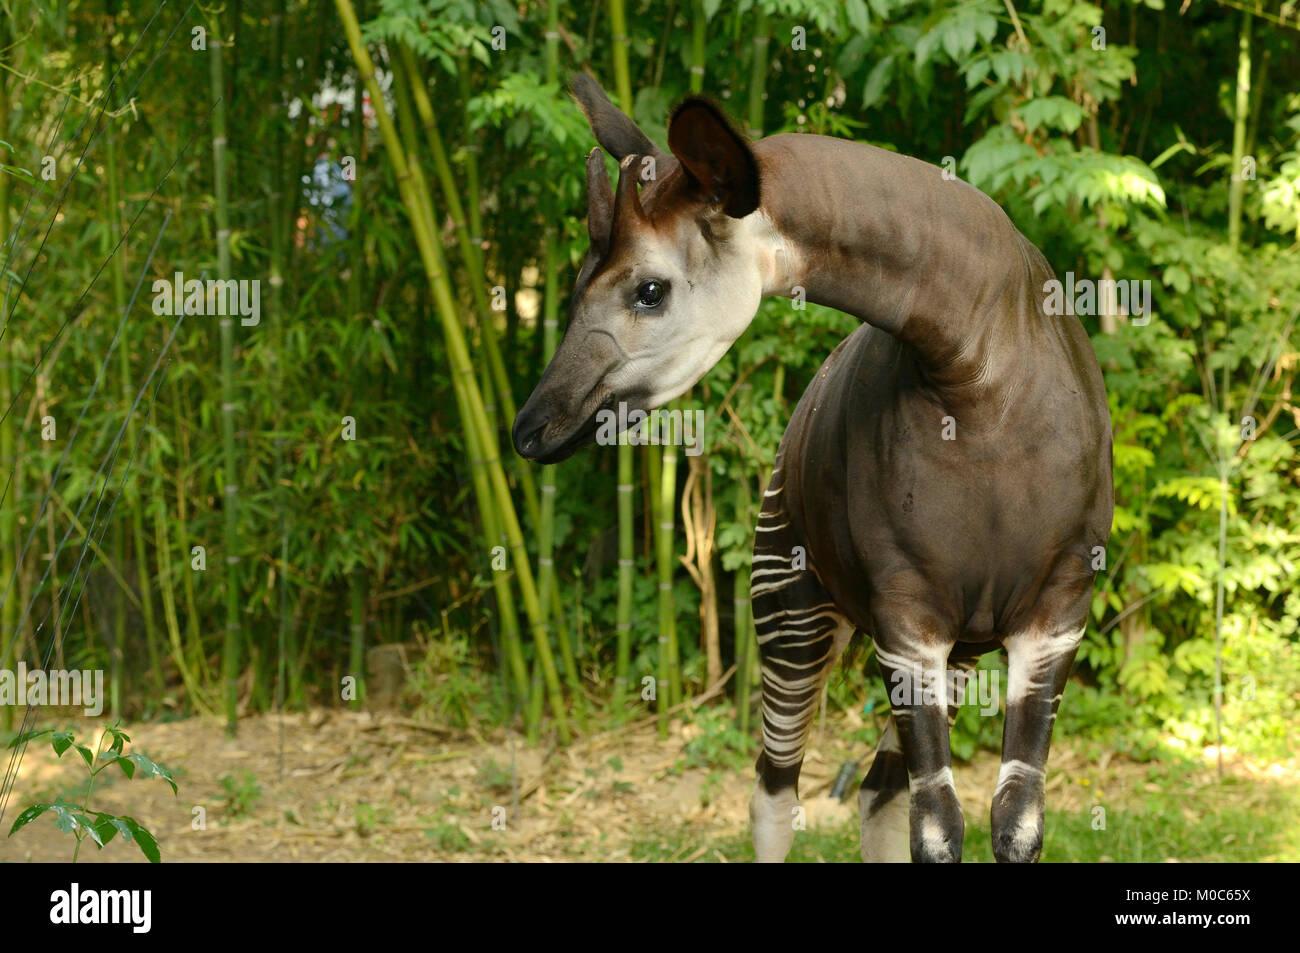 Okapi Okapia johnstoni Endangered species Captive Stock Photo